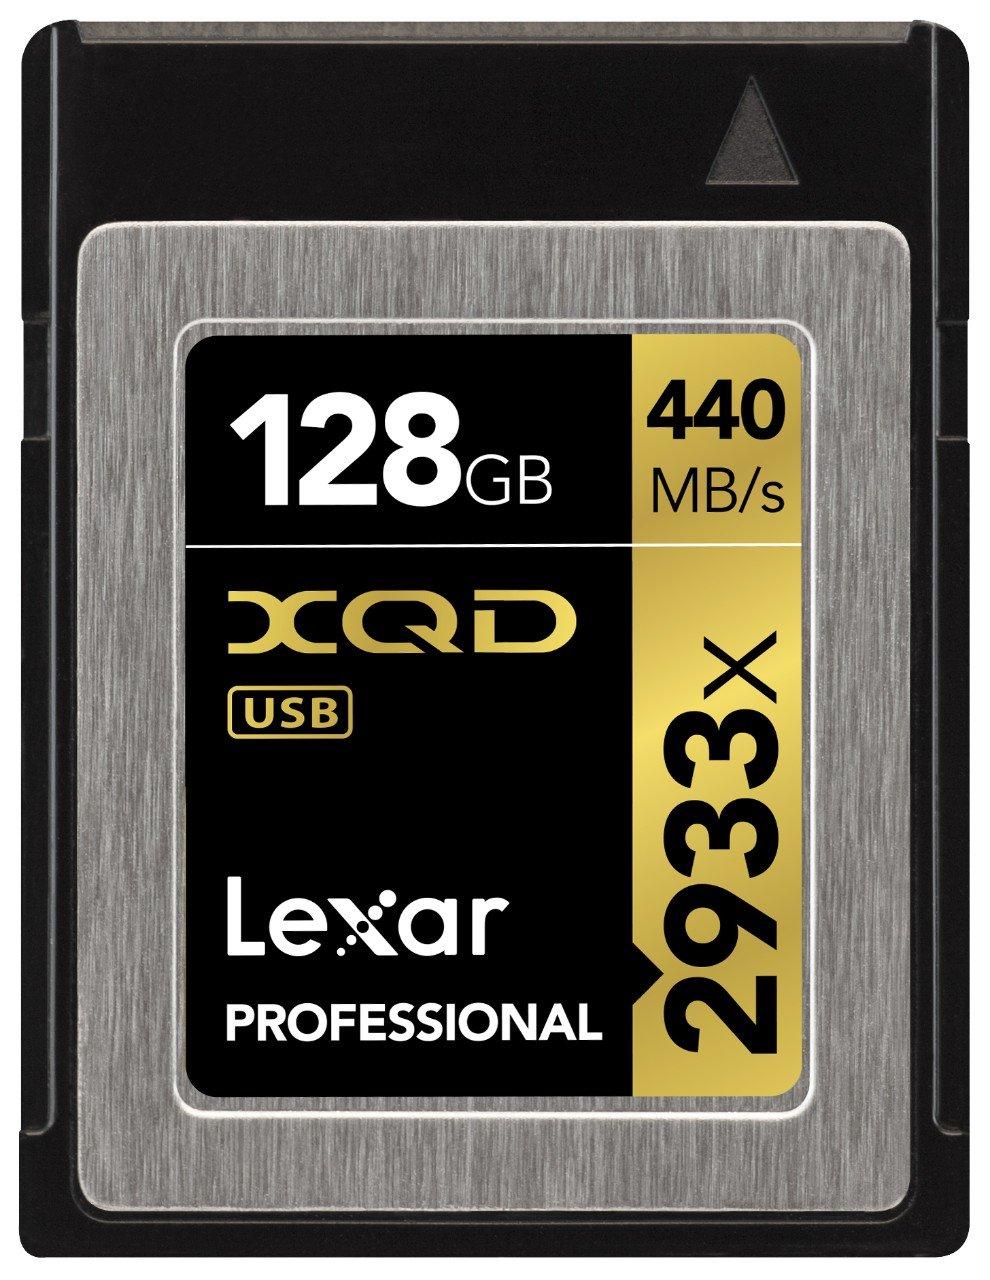 Amazon.com: Lexar 128GB Professional XQD 2.0 2933x Speed ...